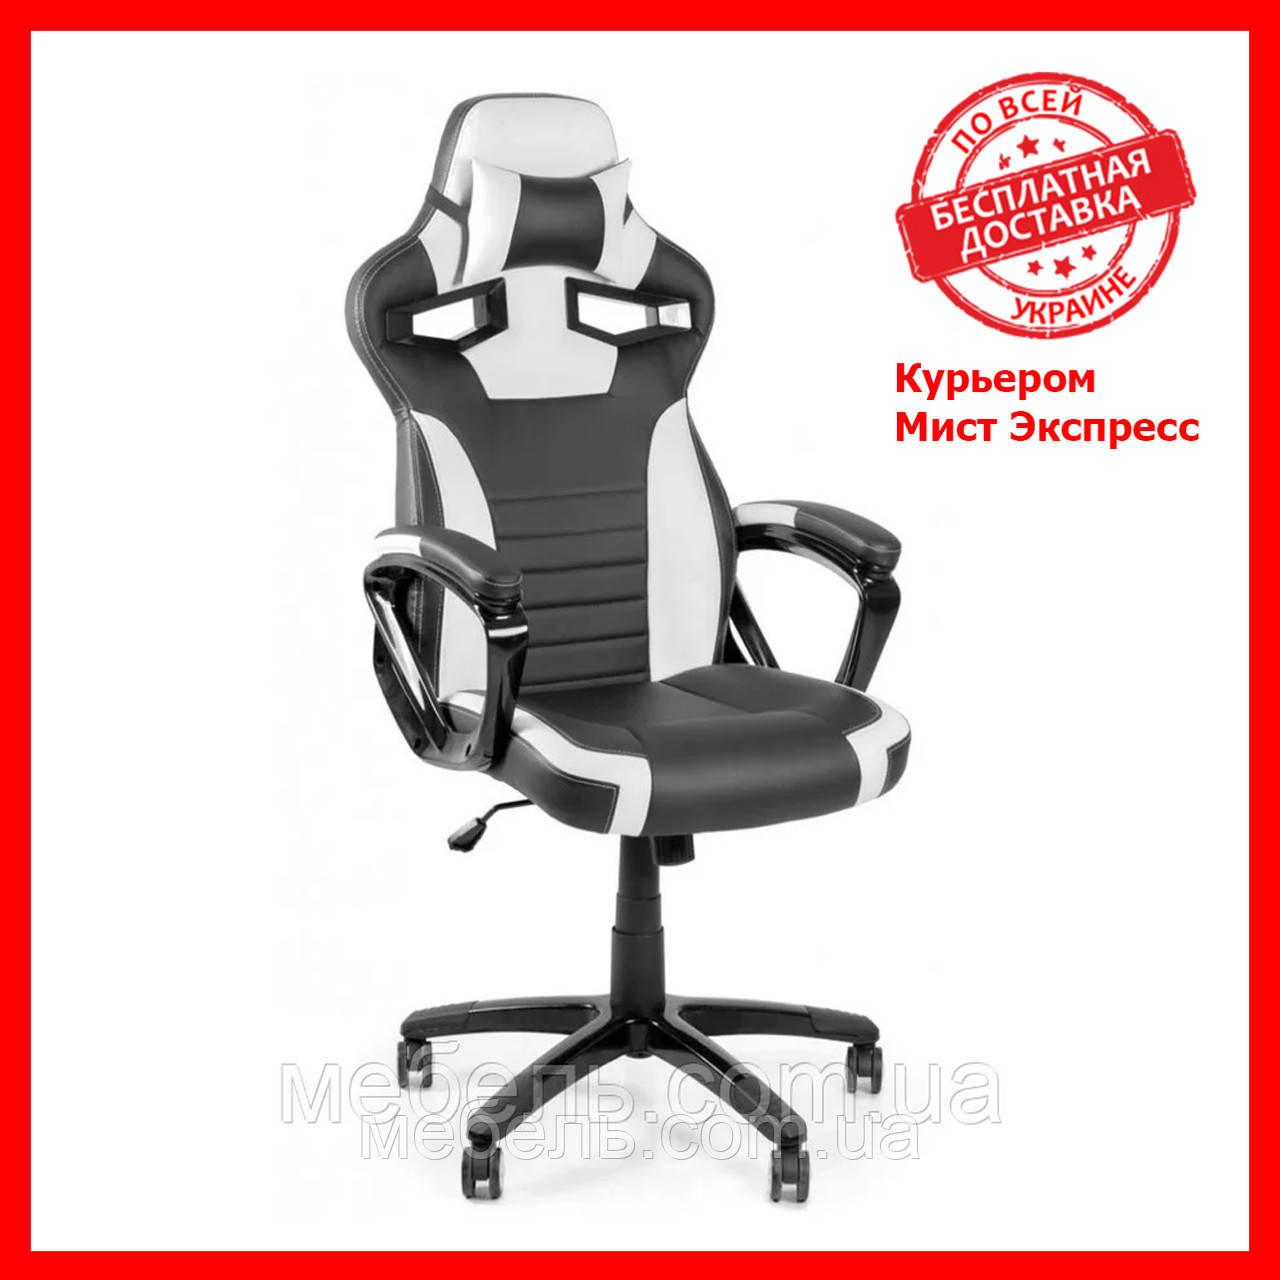 Кресло для врача Barsky SD-17 Sportdrive Game White/Black, черный / белый